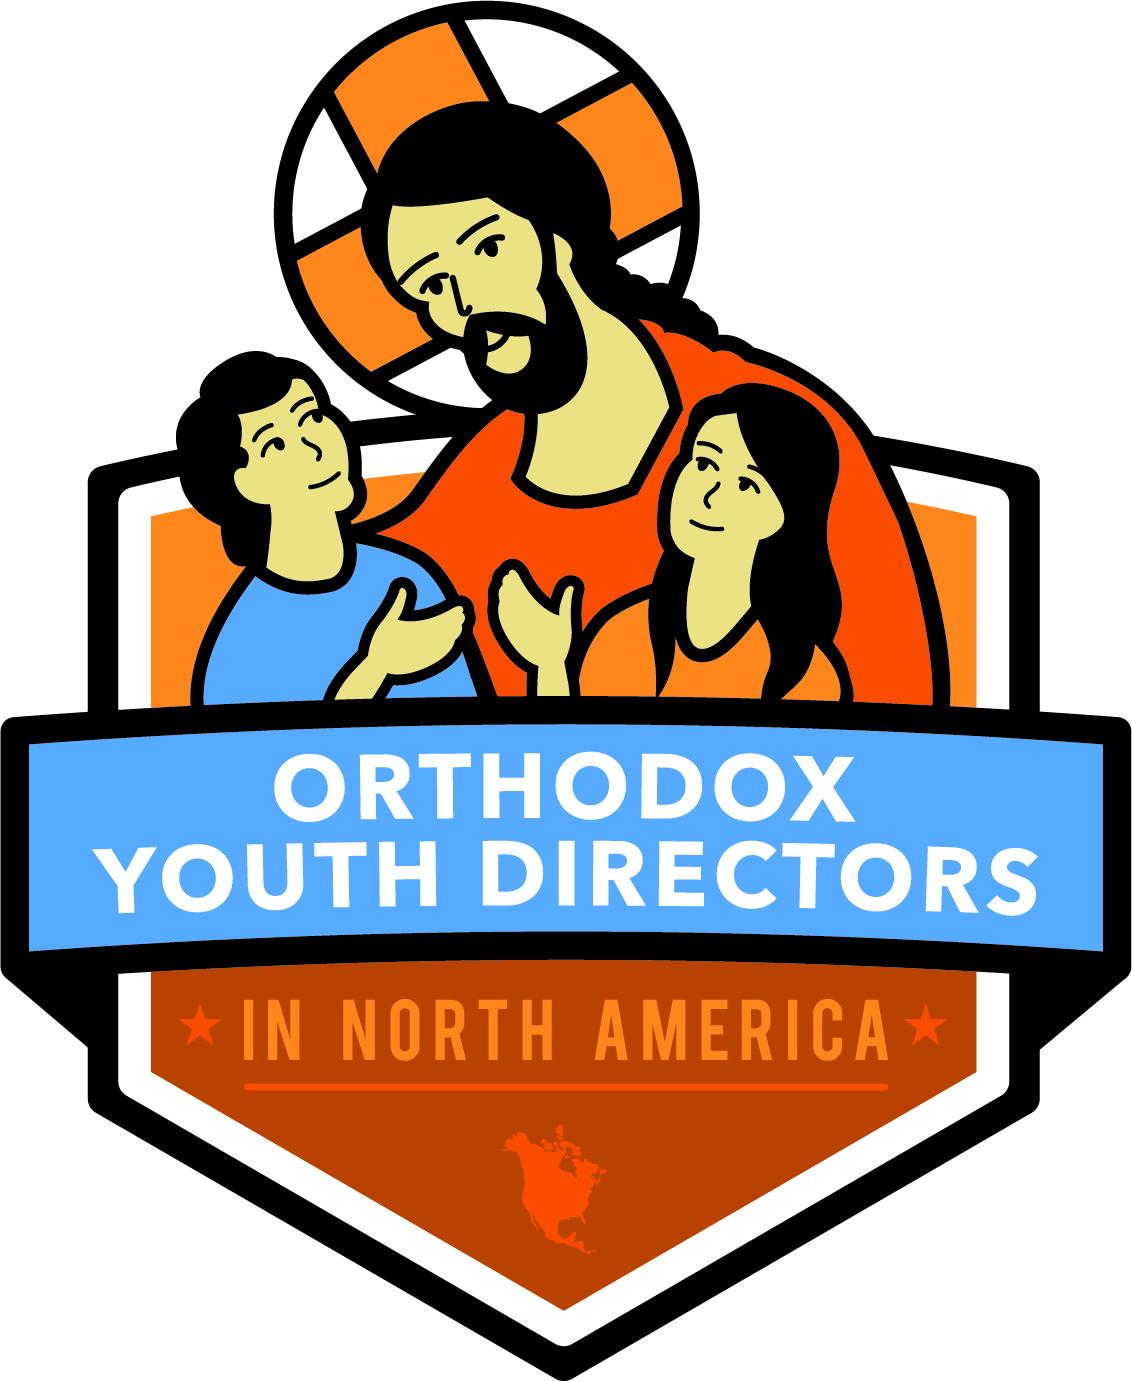 Orthodox Youth Directors in North America